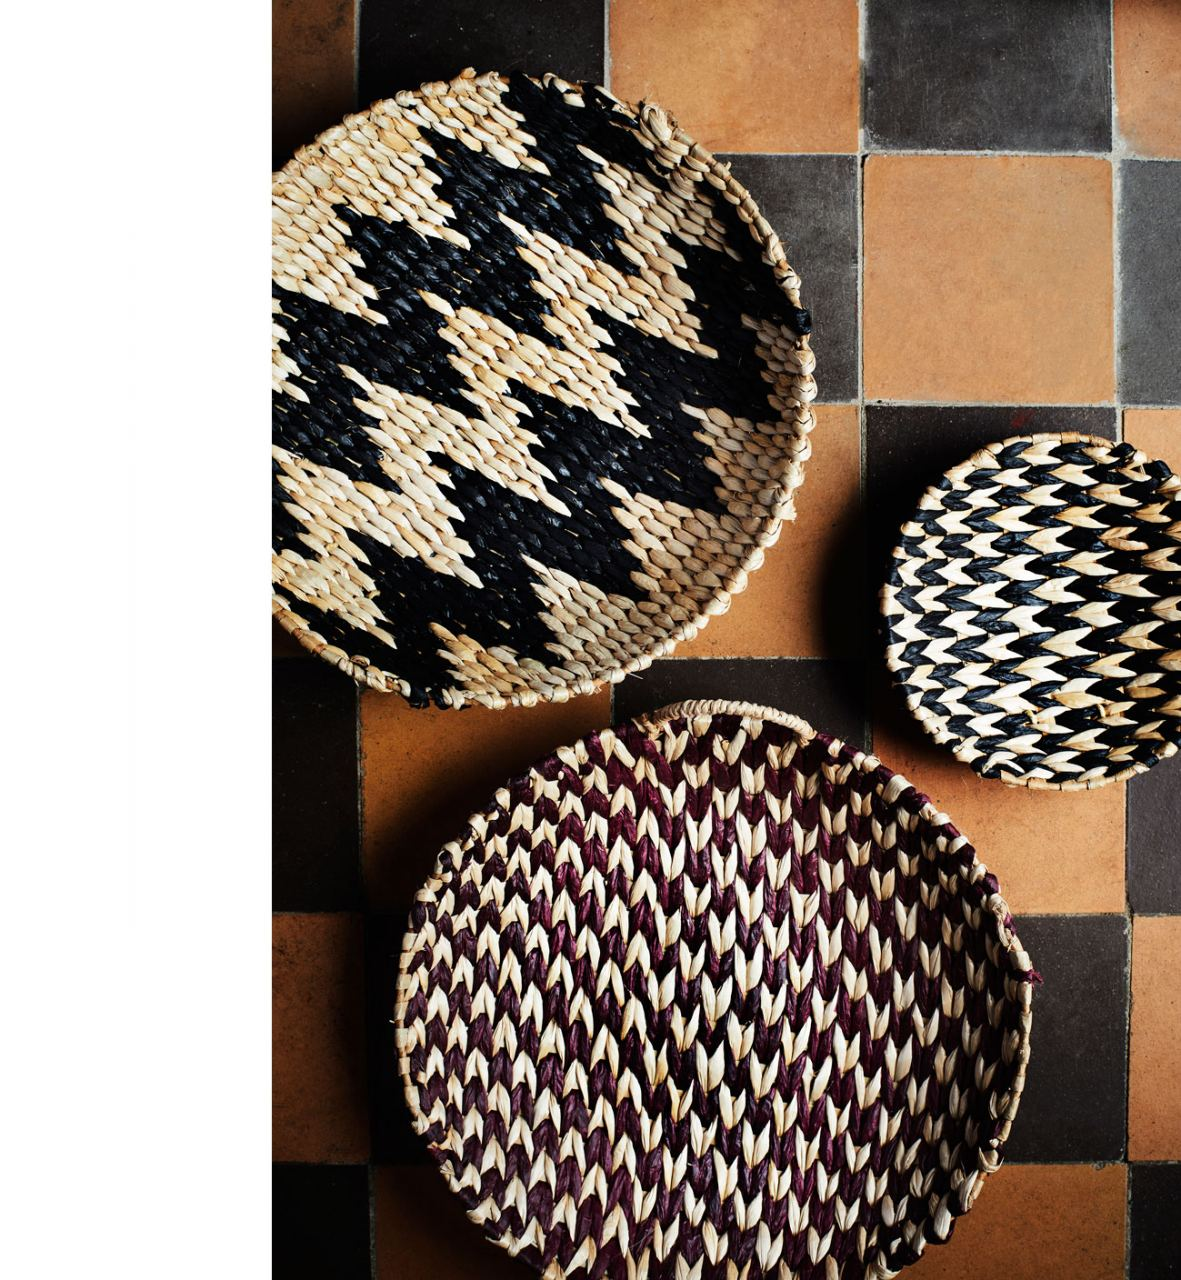 Round Wicker Tray Natural/Black